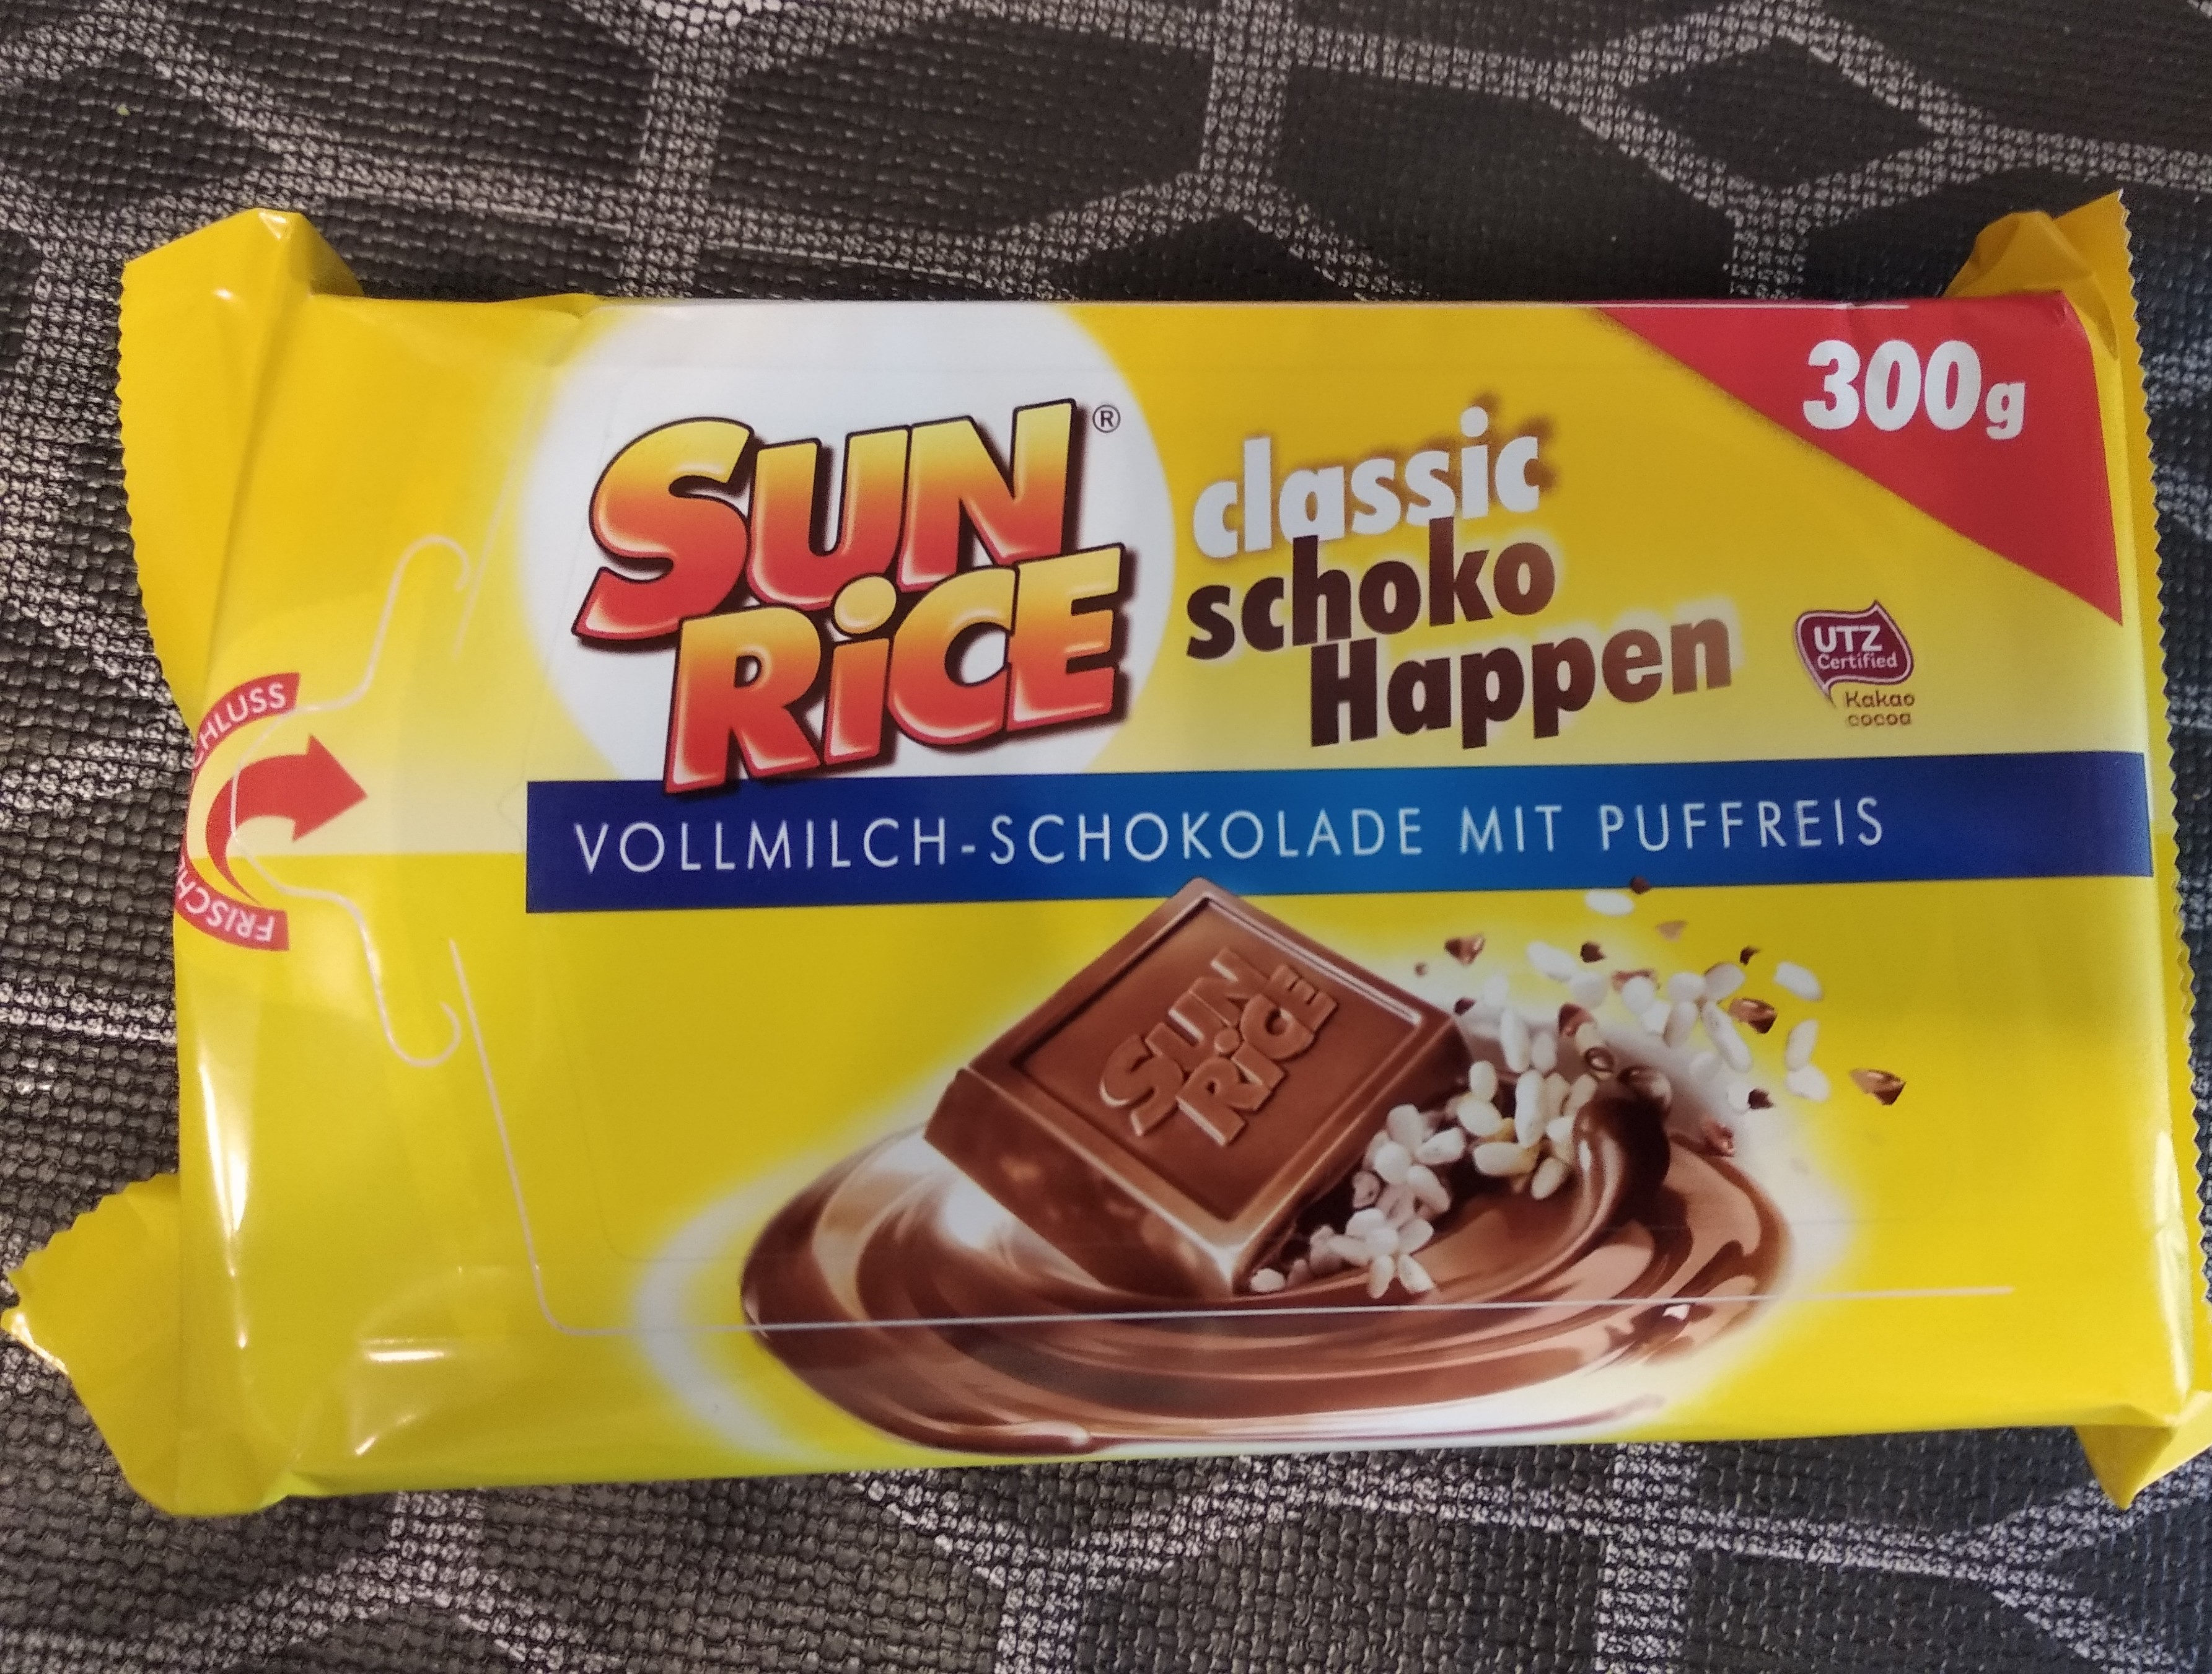 Sun Rice Classic Schoko-happen 300G - Product - fr